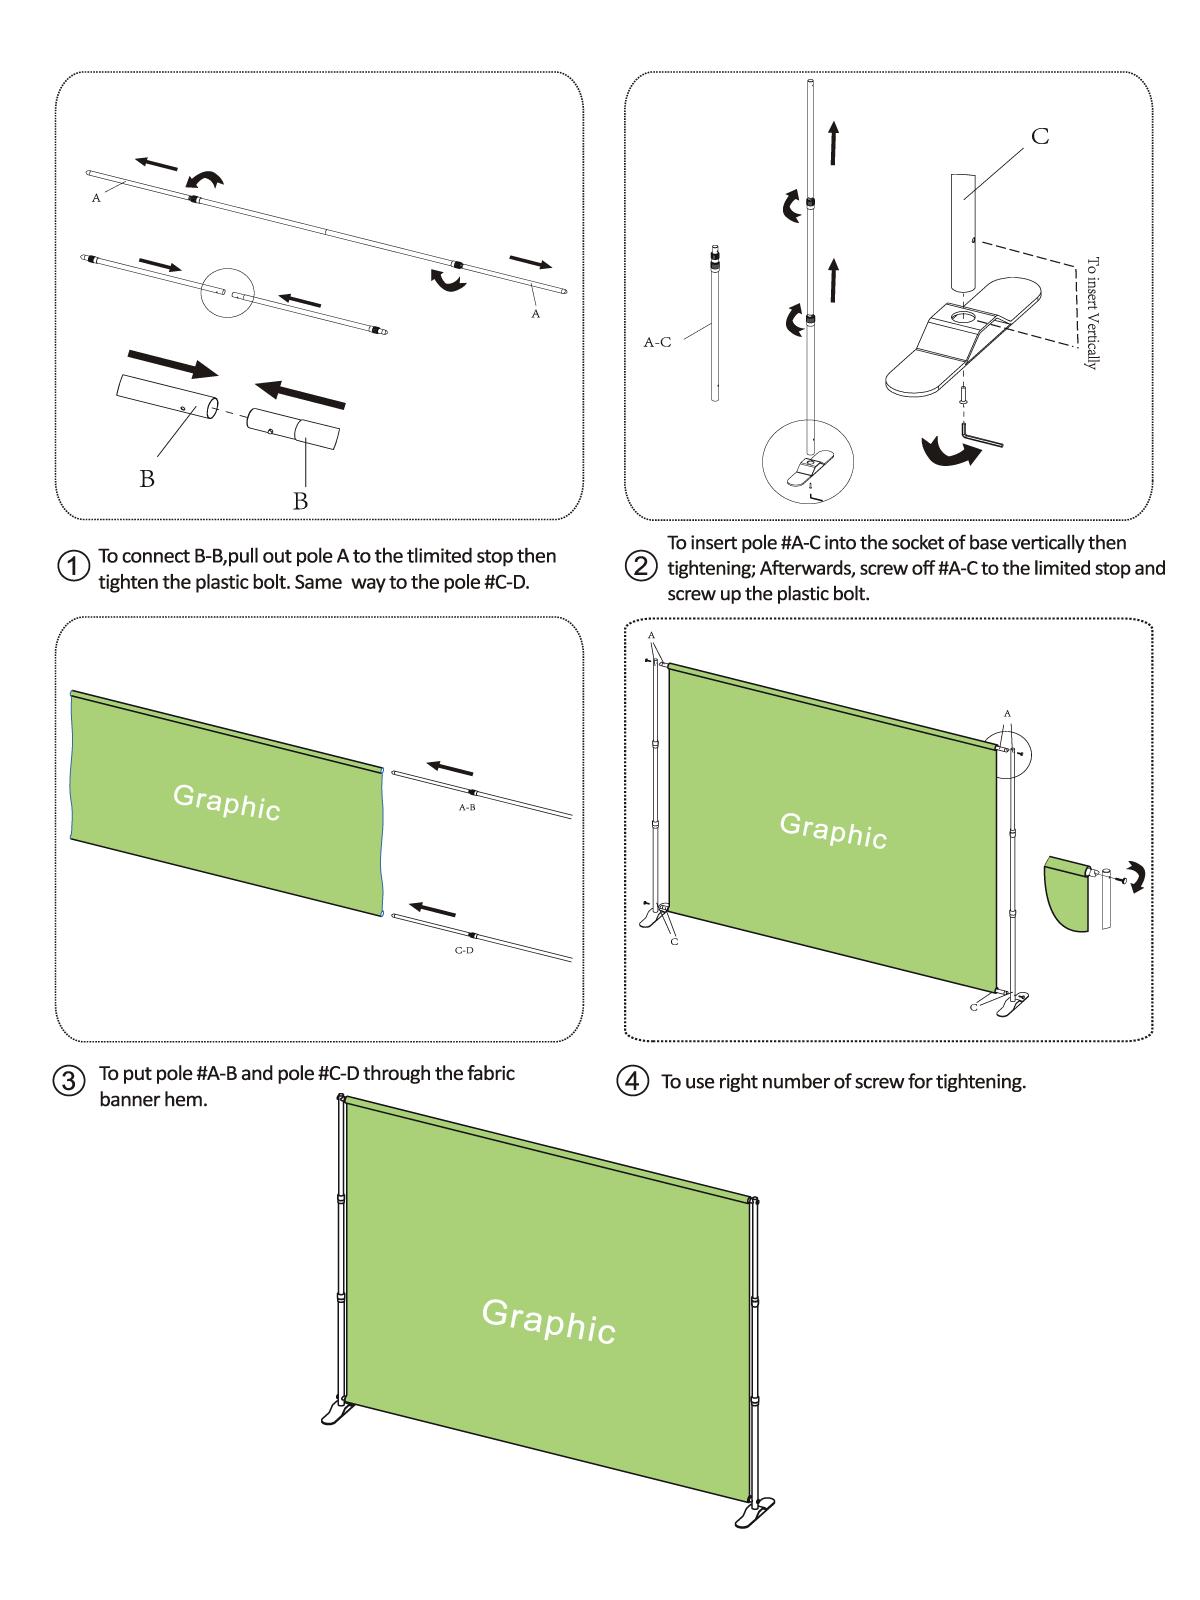 steprepeat-instructions.png